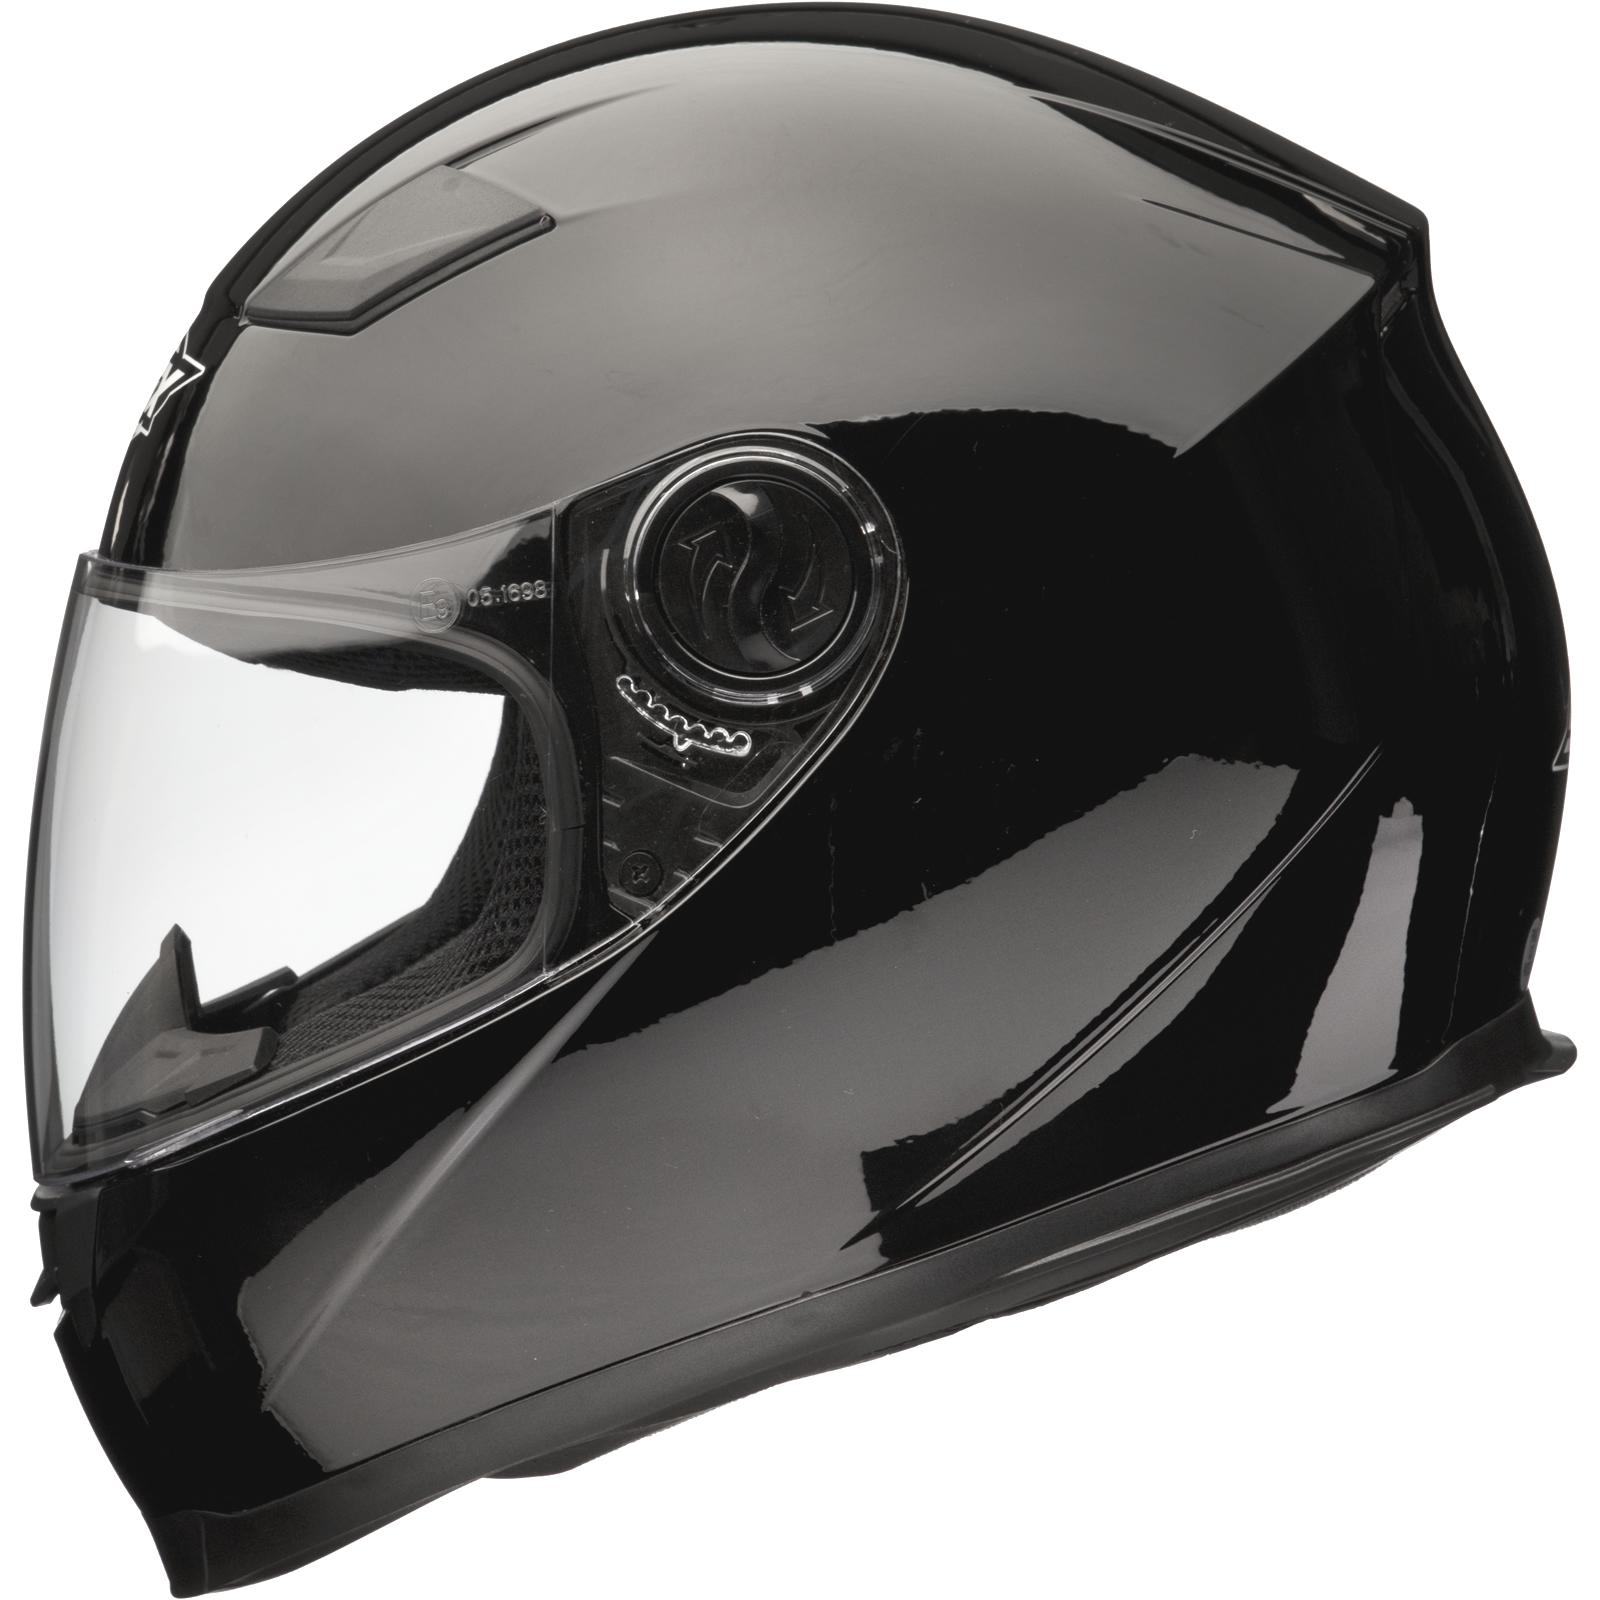 Shox Sniper Full Face Acu Gold Approved Motorbike